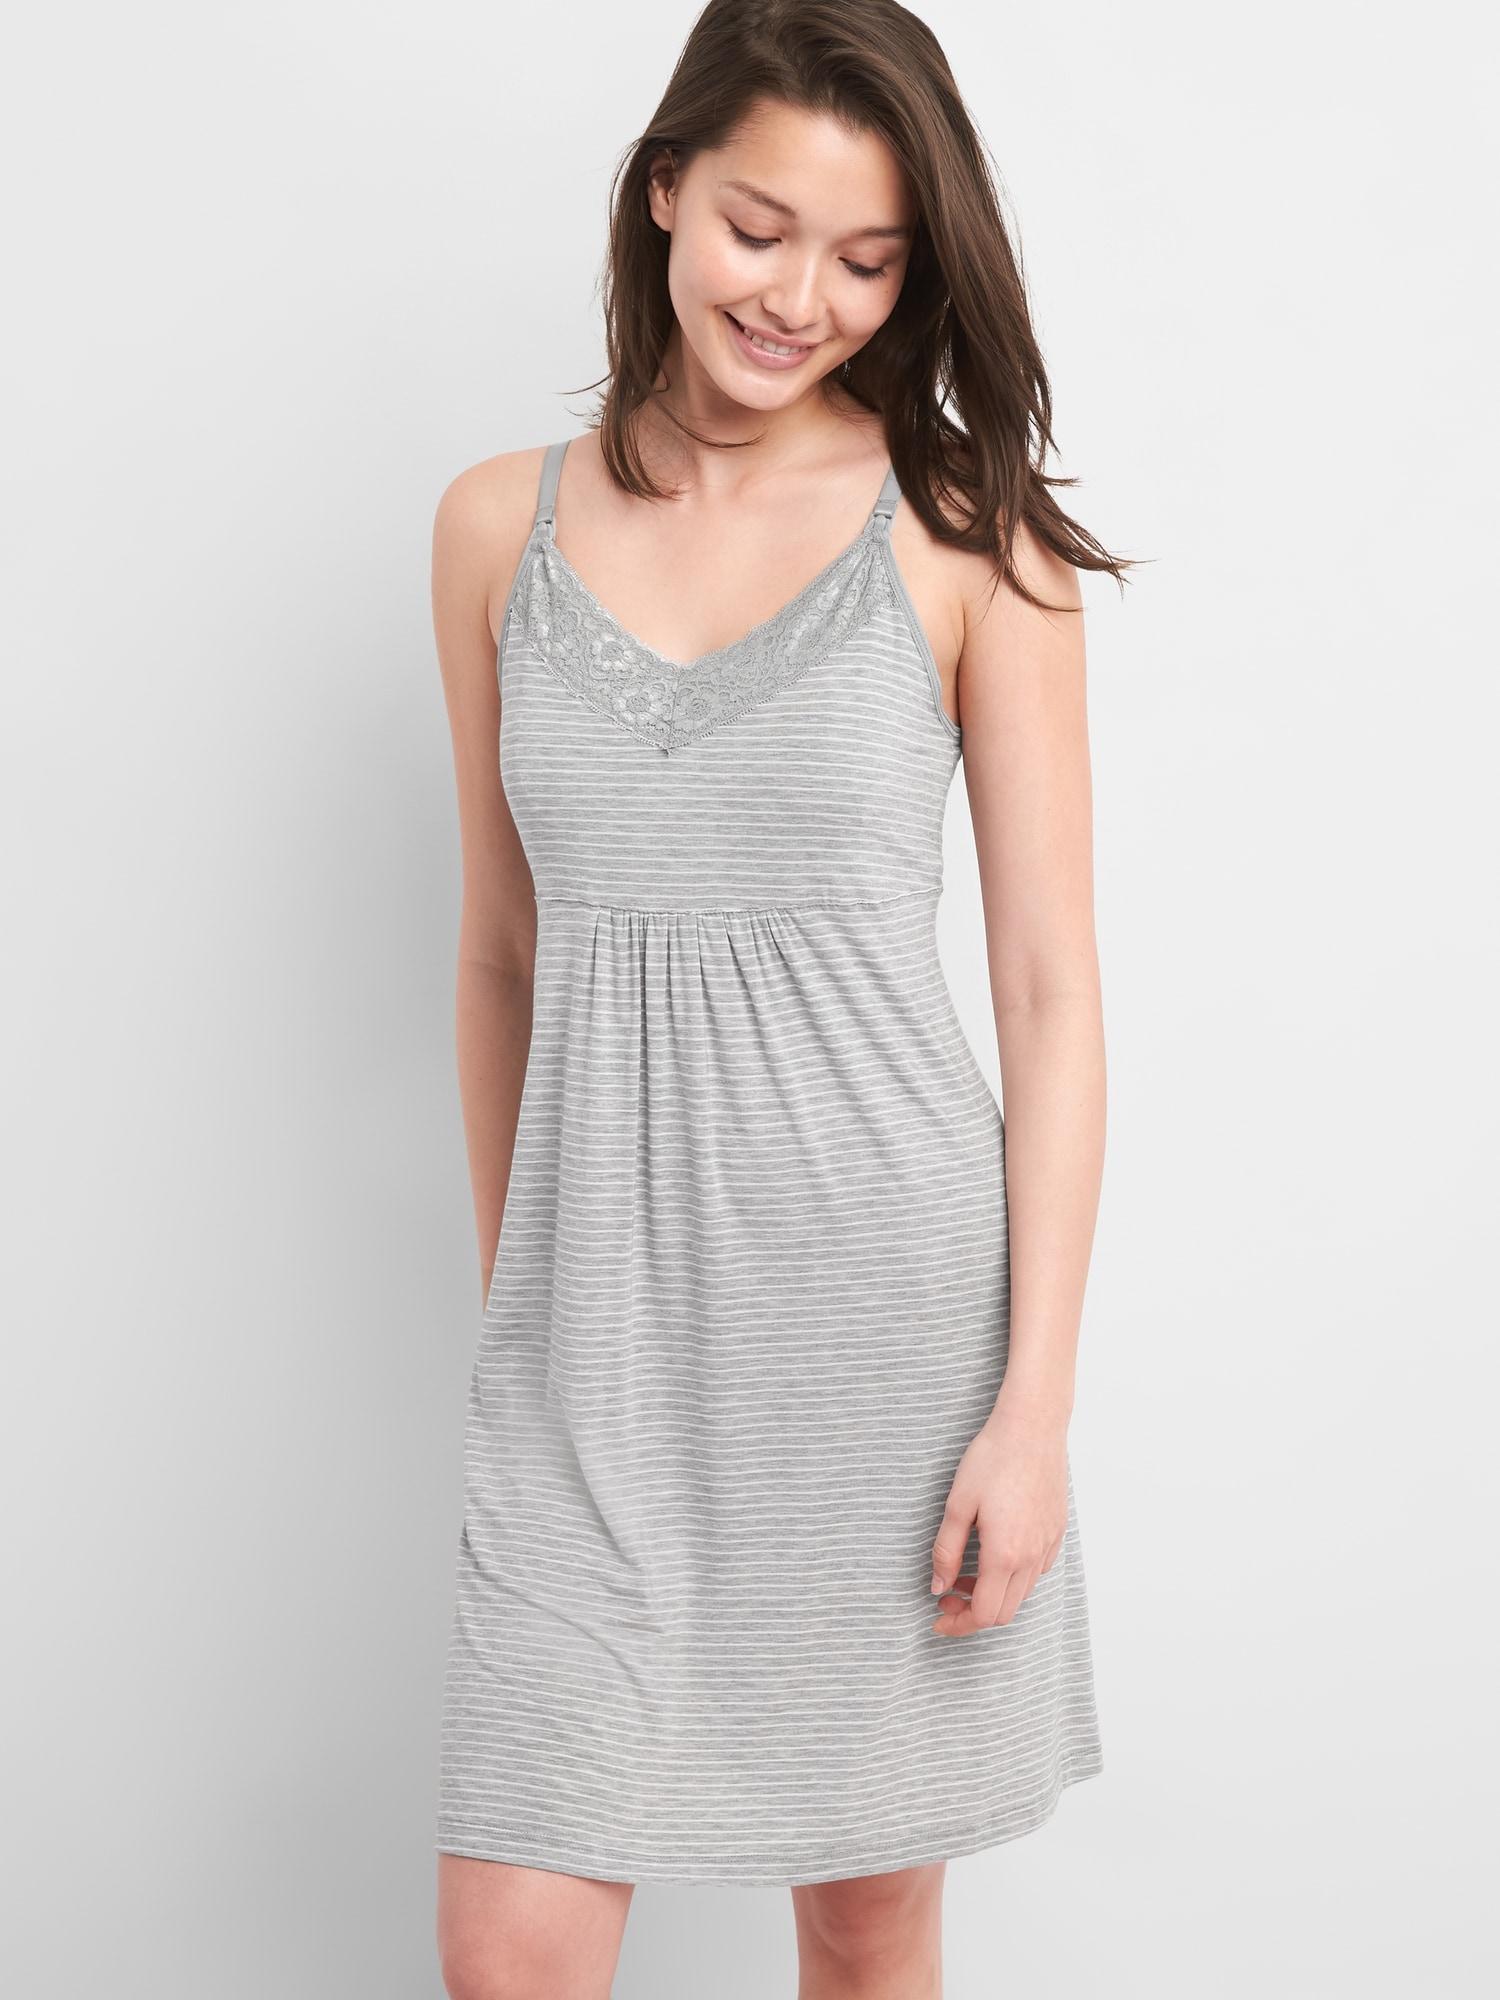 282472b6e7344 Lyst - Gap Maternity Nursing Nightgown in Gray